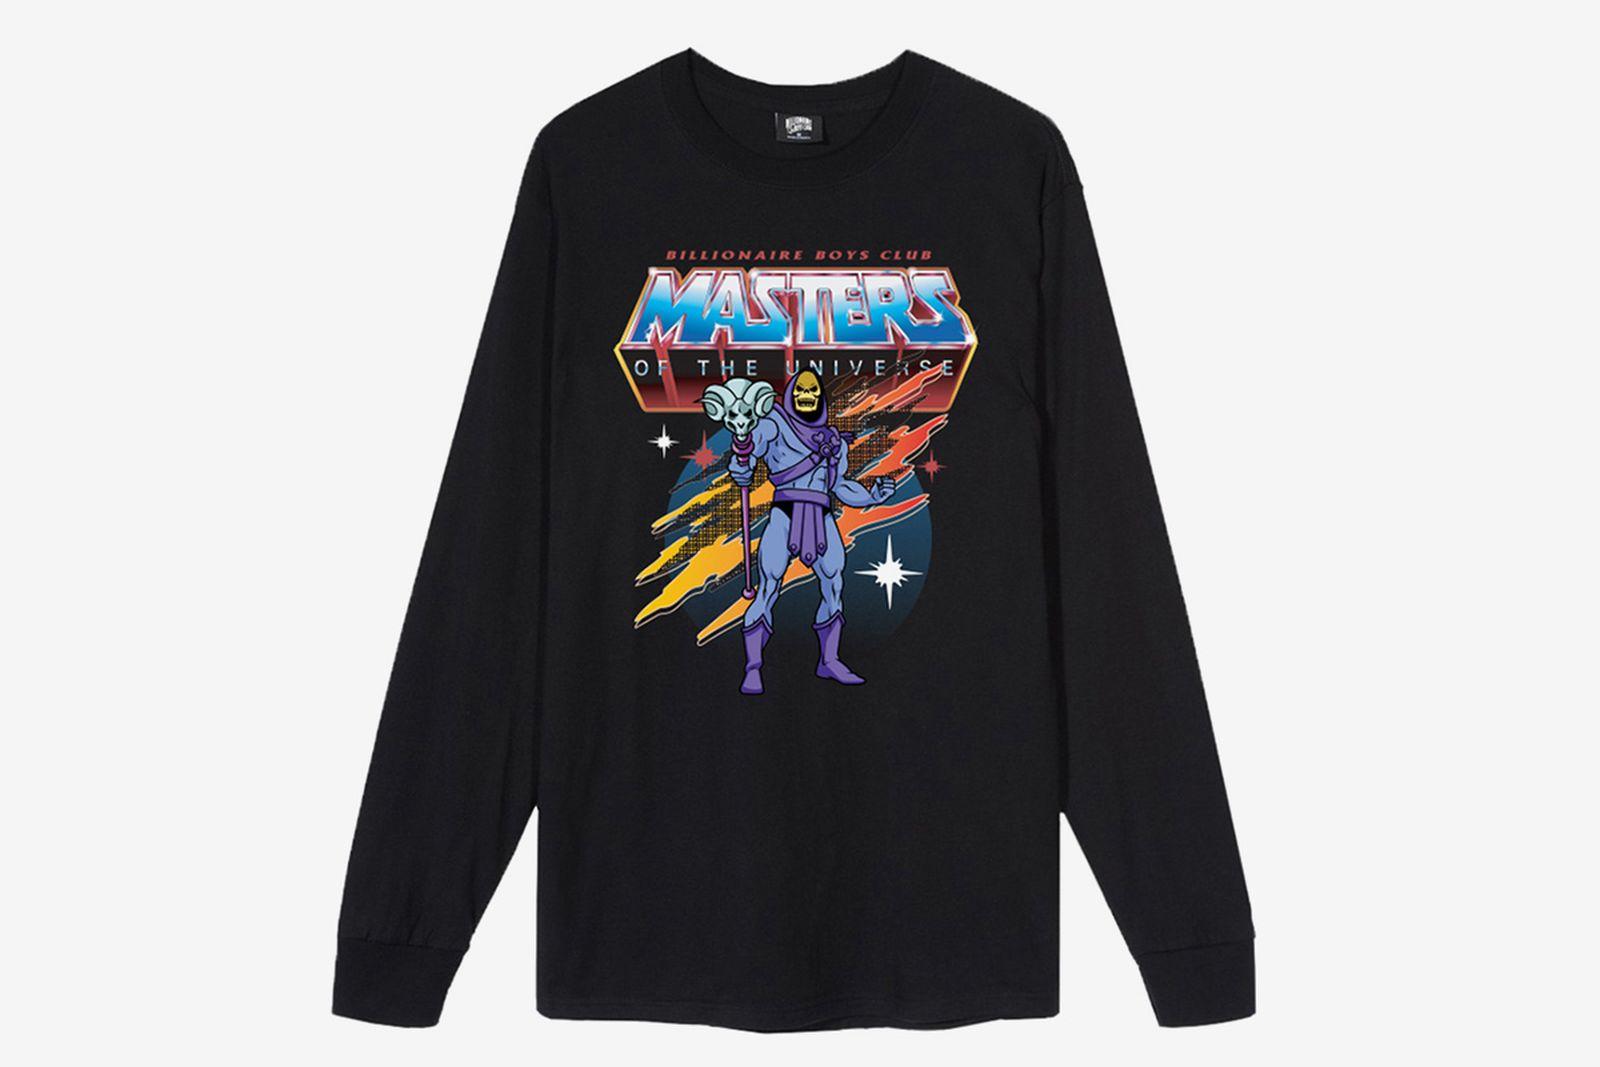 Billionaire Boys Club x Mattel's Spooky 'Master of the Universe' long sleeve black